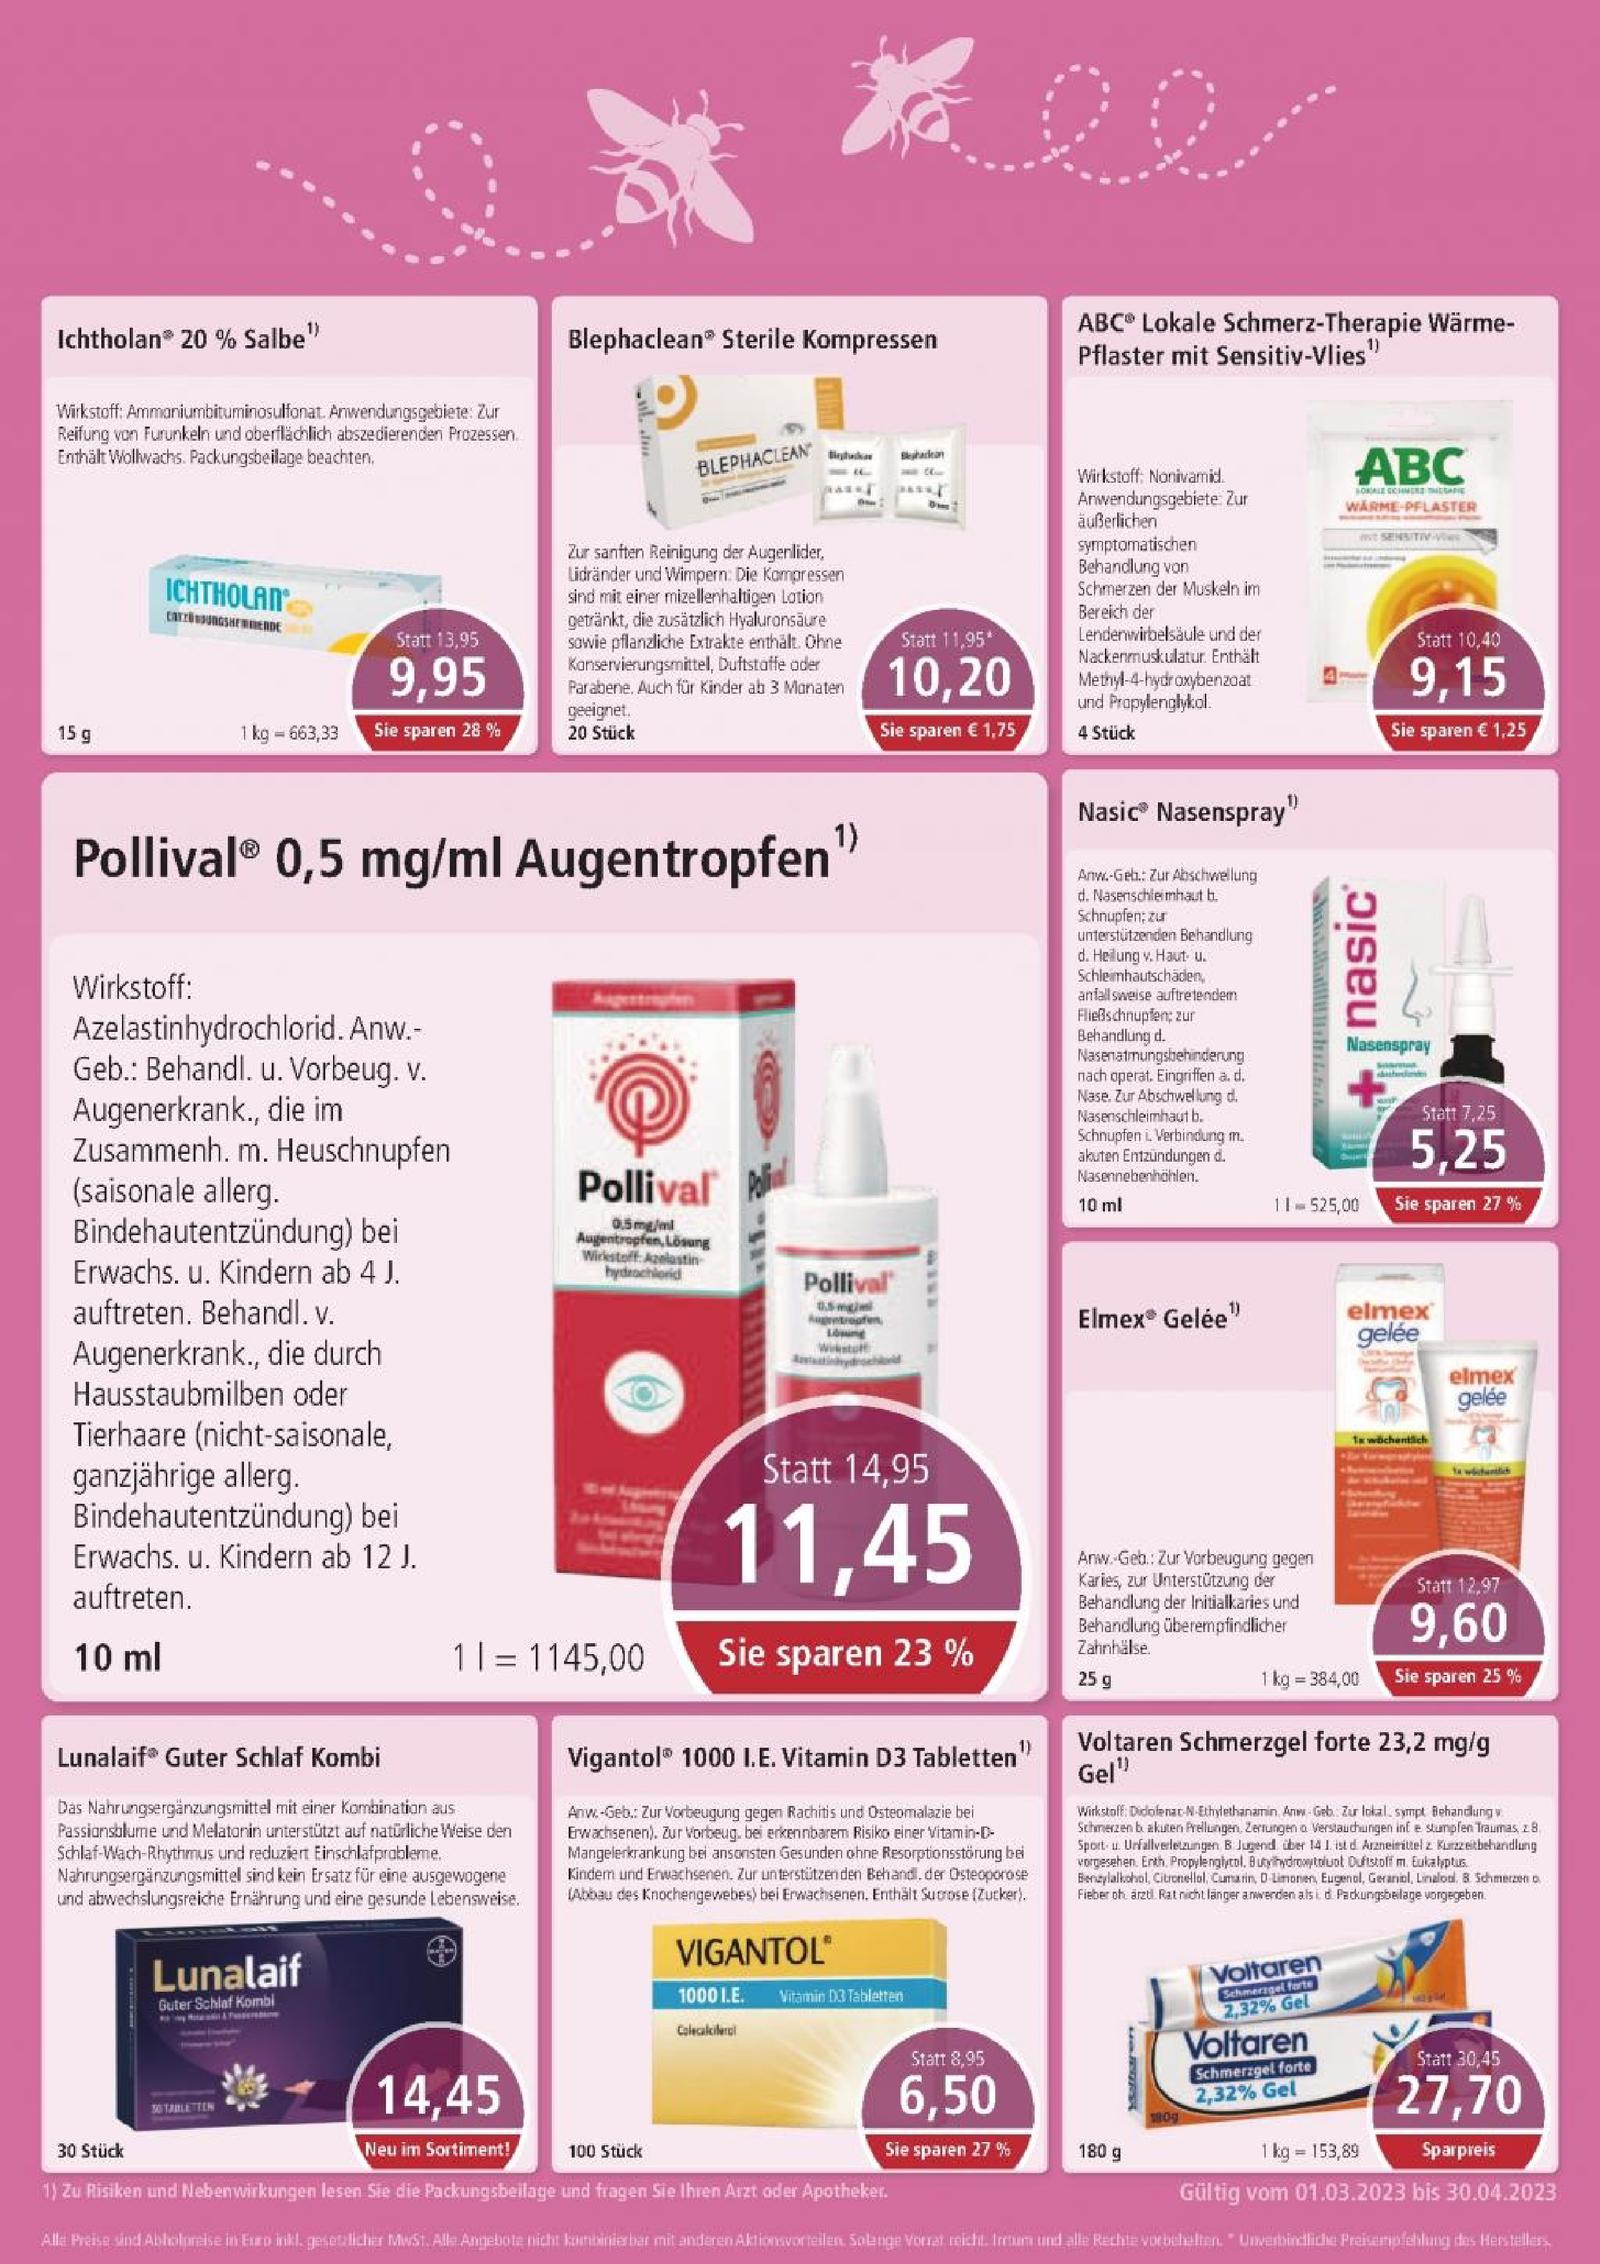 https://mein-uploads.apocdn.net/5765/leaflets/5765_flyer-Seite3.png